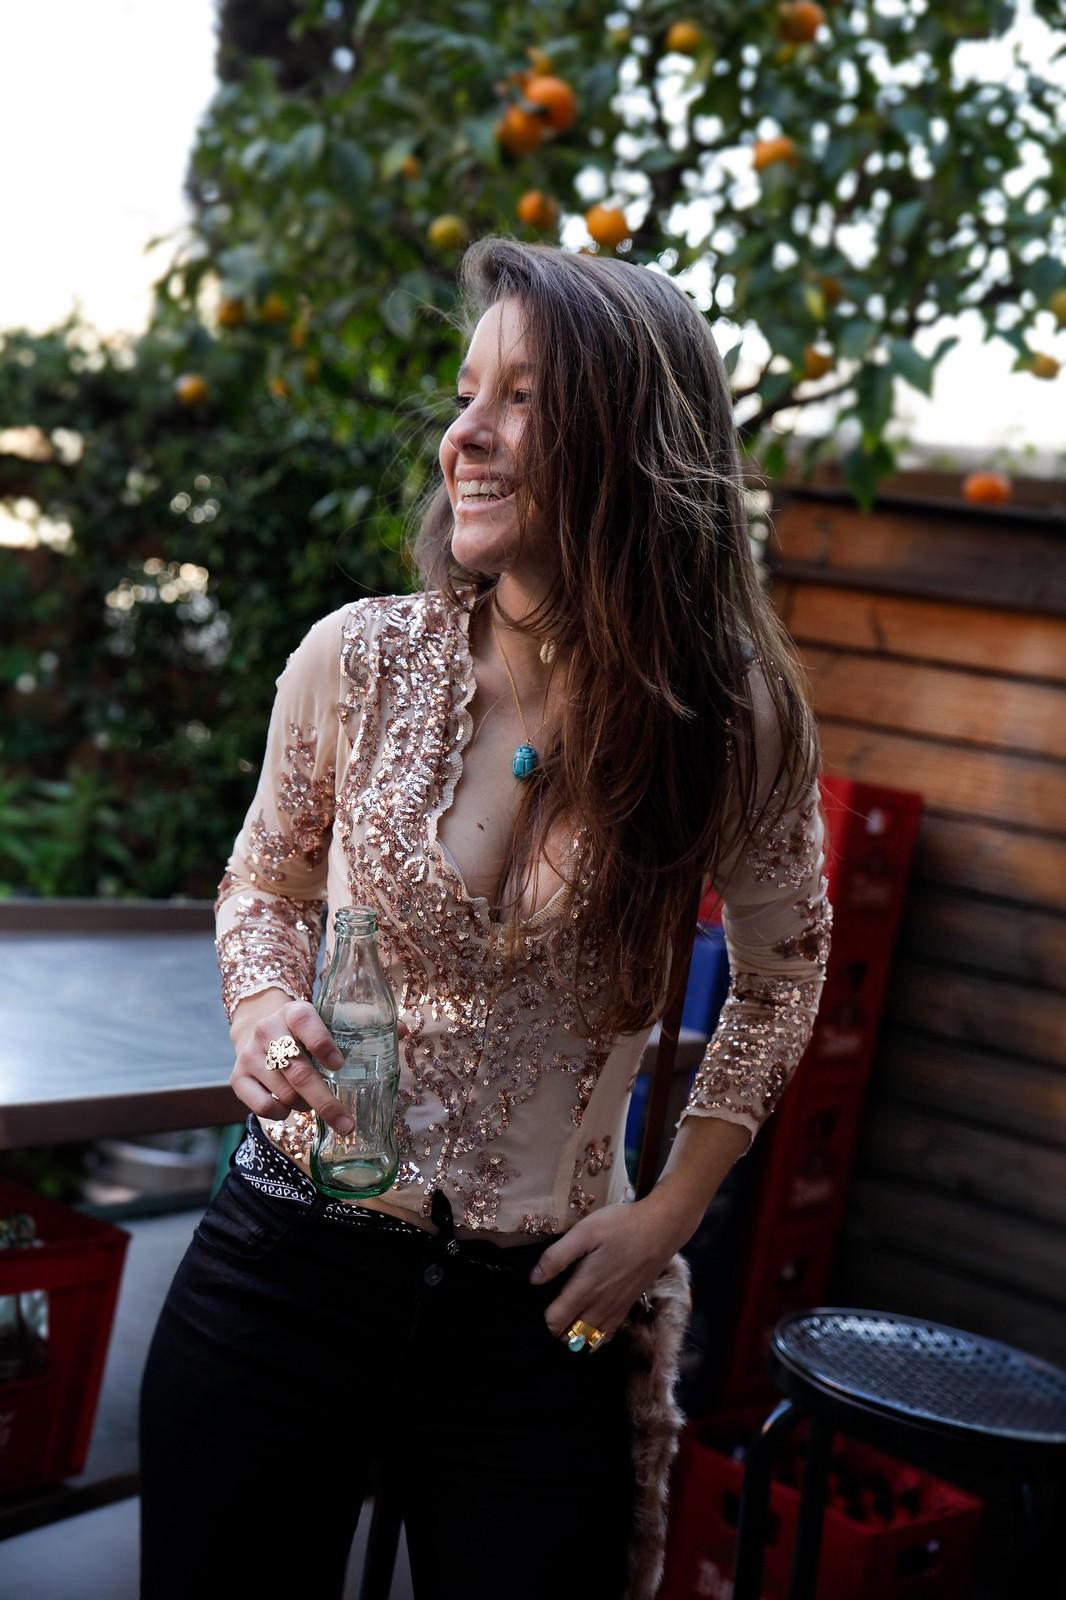 04_Sequins_Body_Nihgt_outfit_Danity_Paris_theguestgirl_laura_santolaria